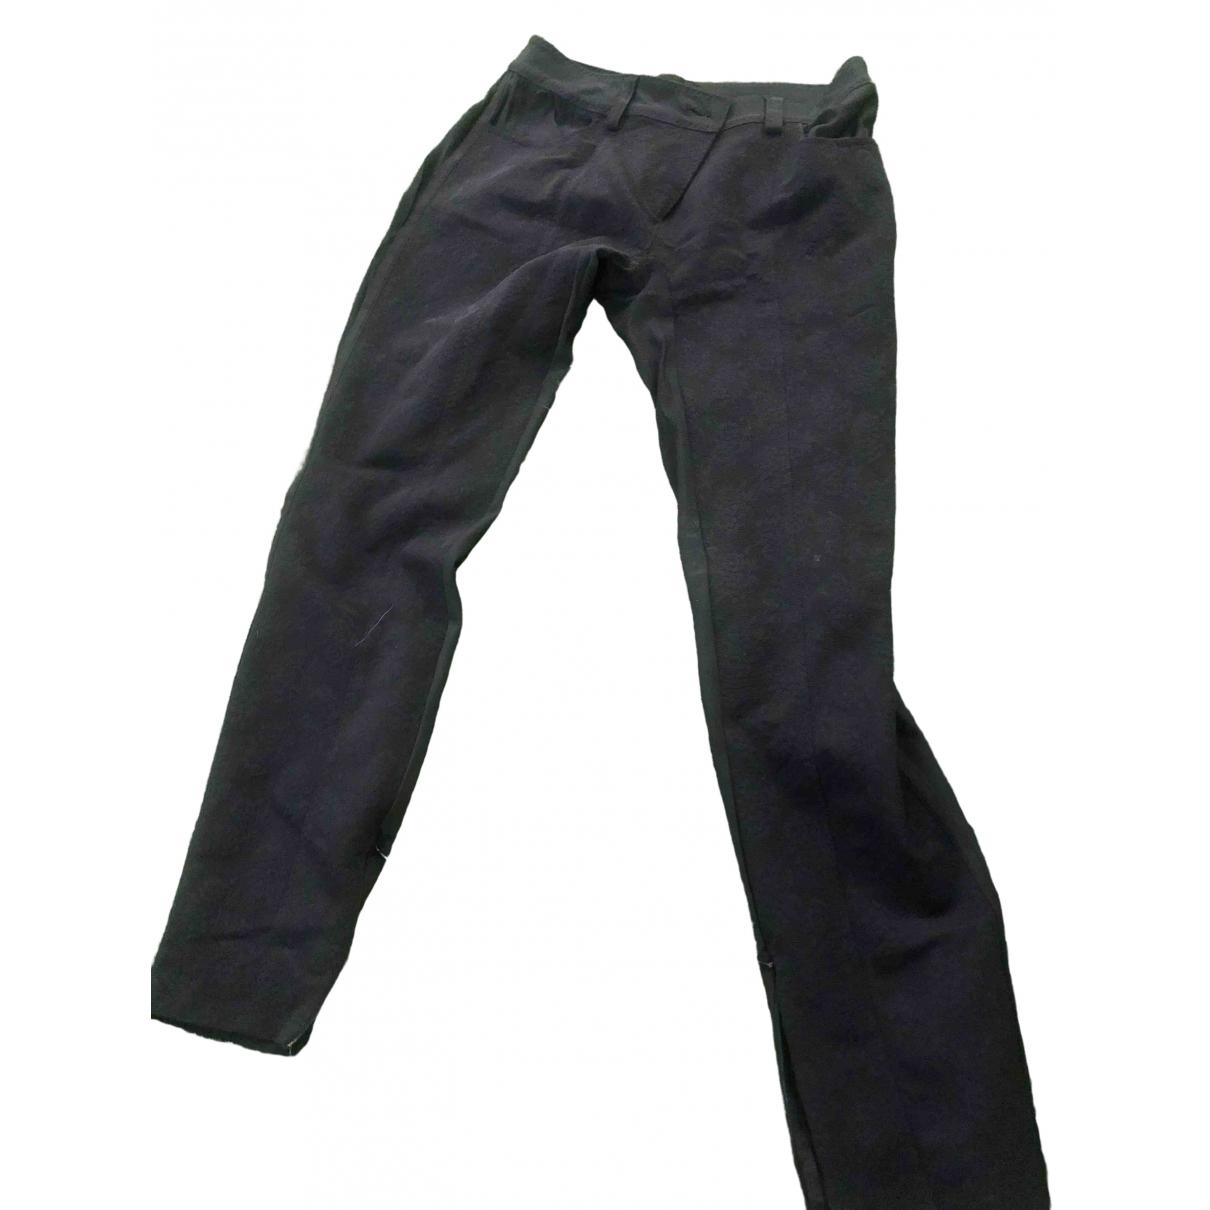 Pantalon en Elastano Negro D&g